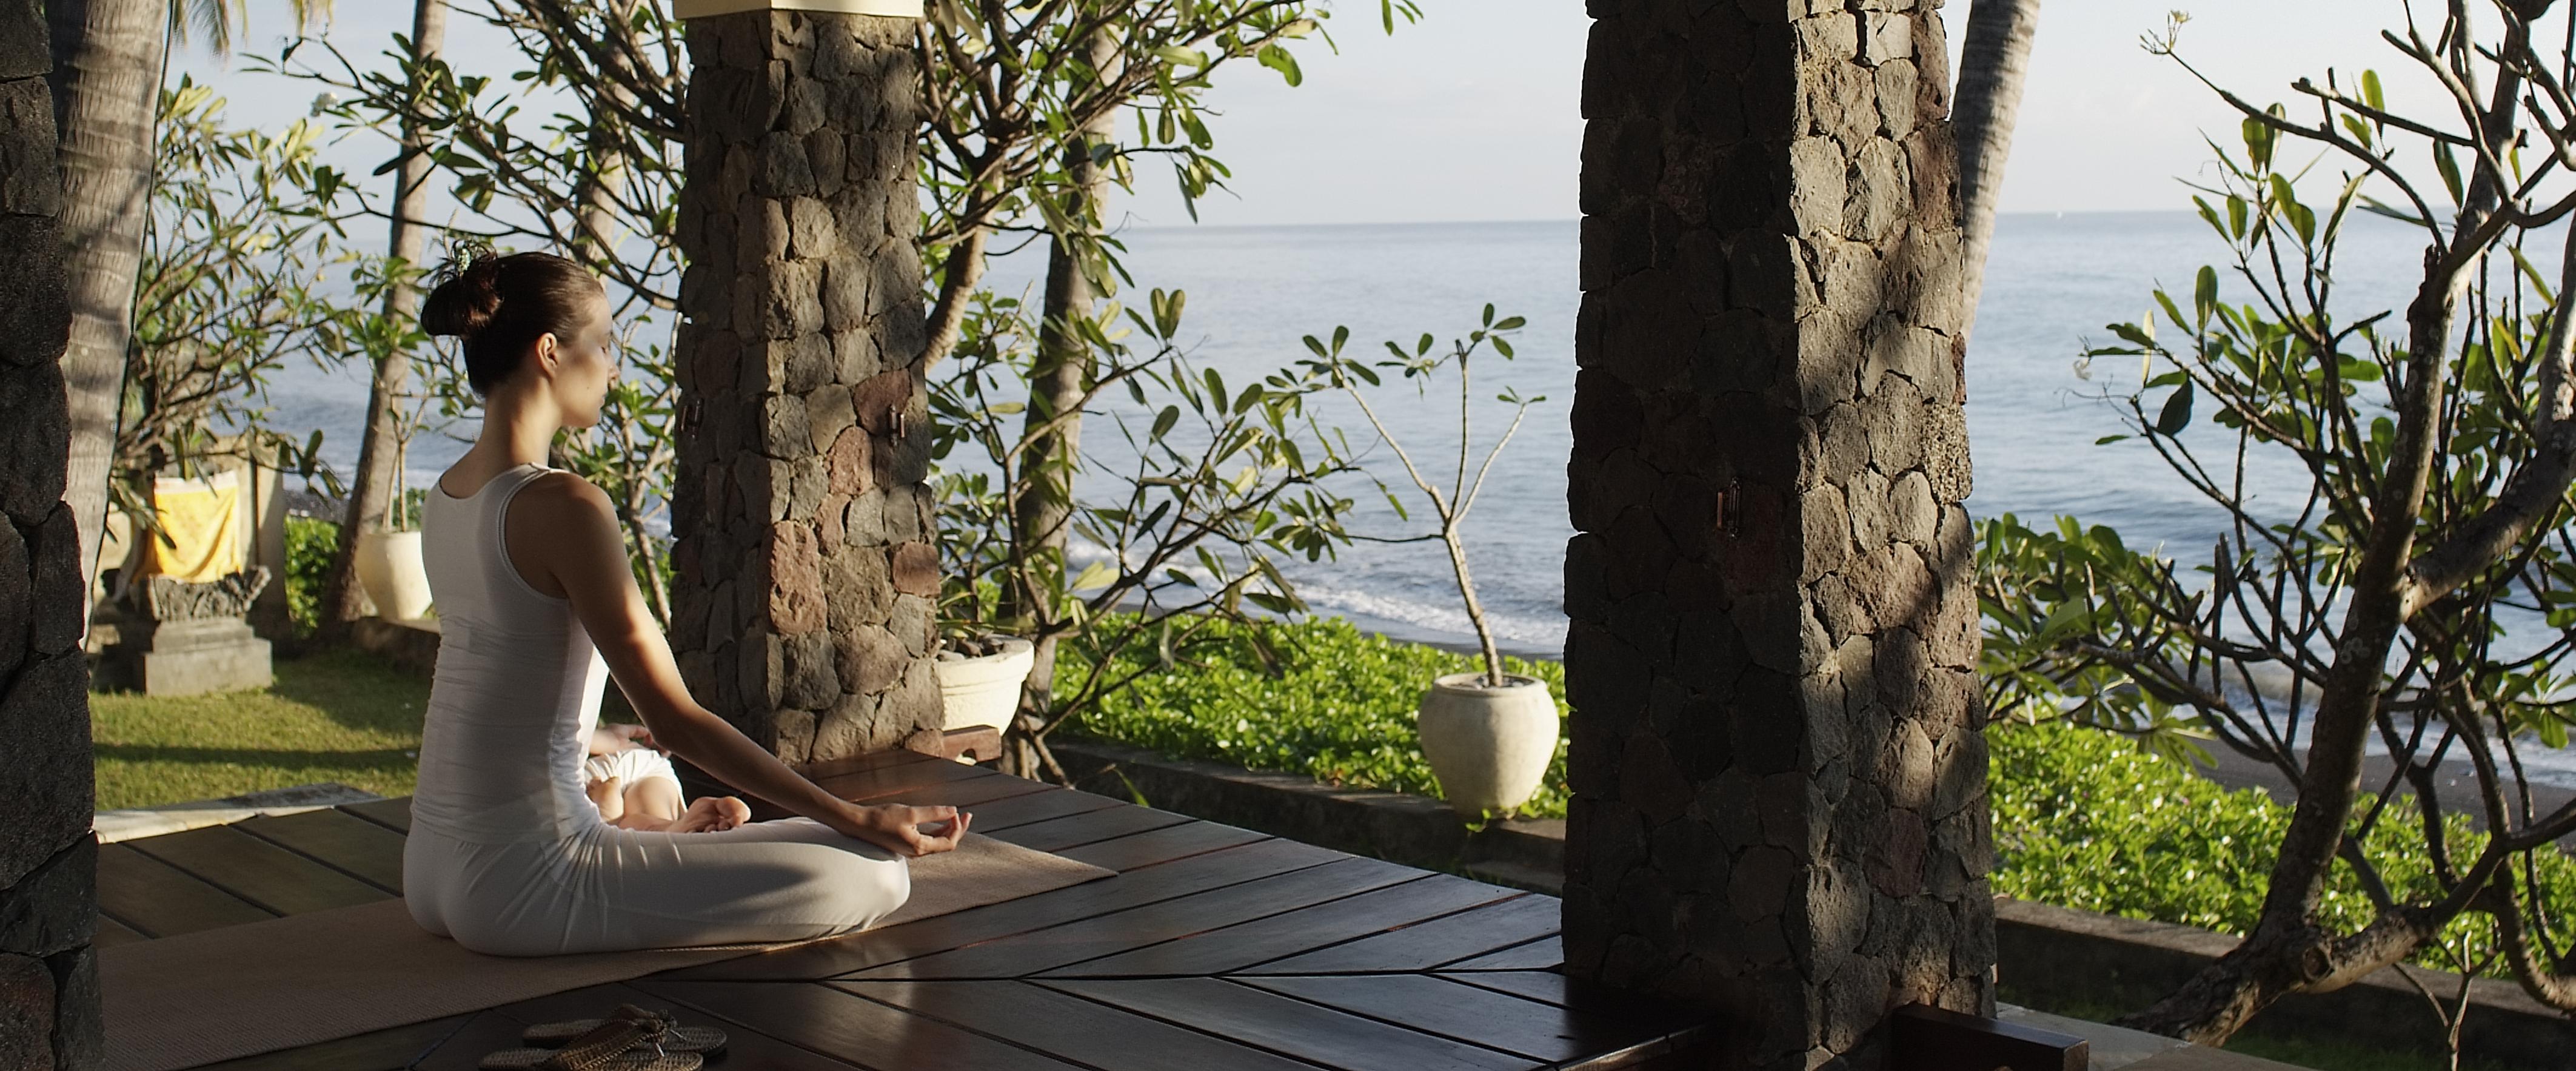 yoga-pavilion-spa-village-tembok